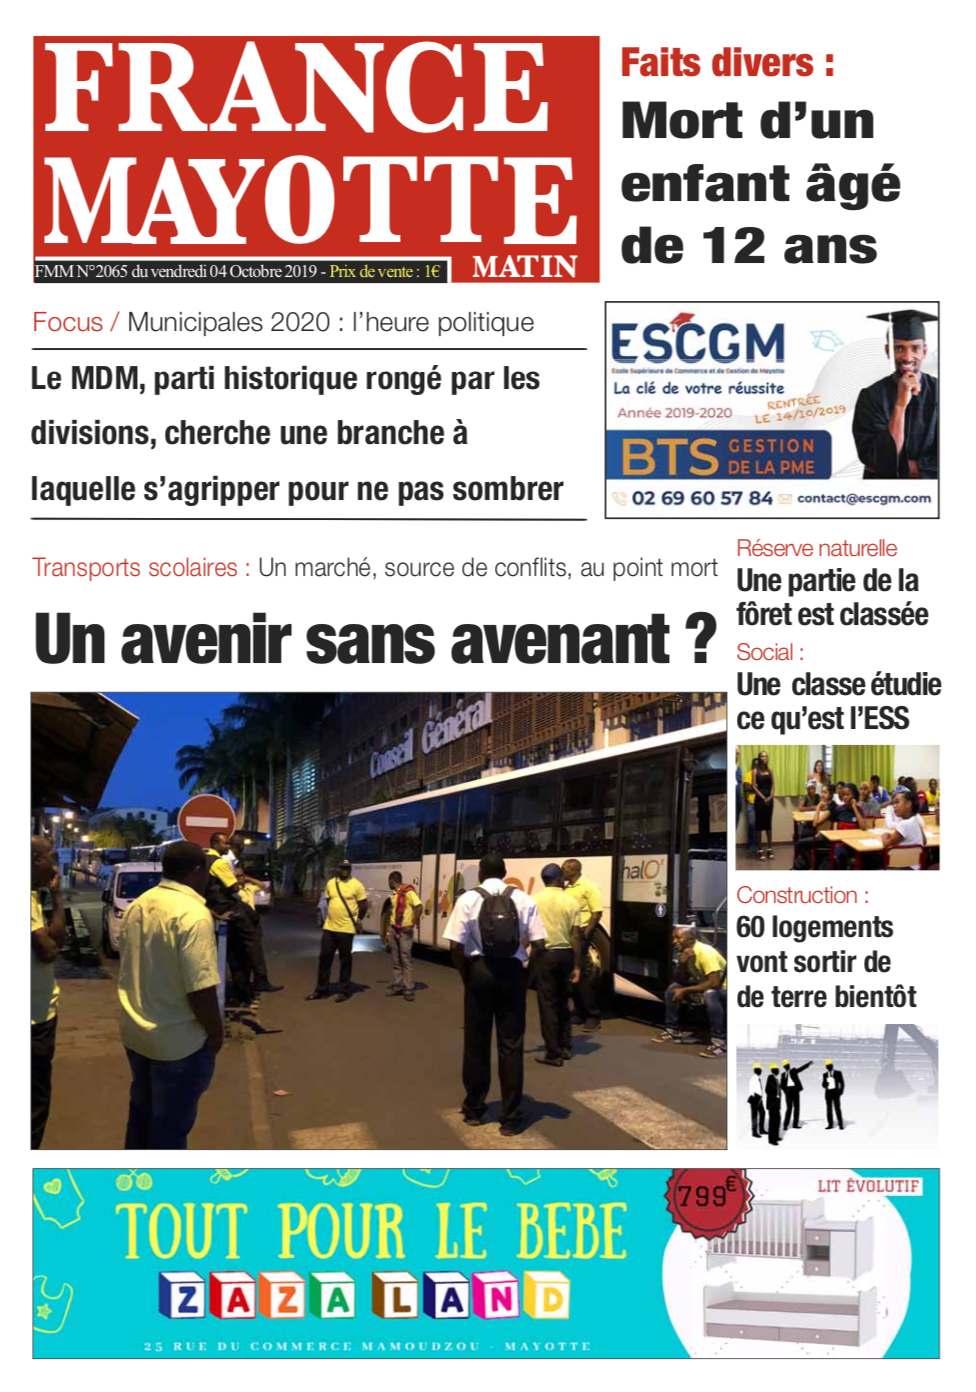 France Mayotte Vendredi 5 octobre 2019